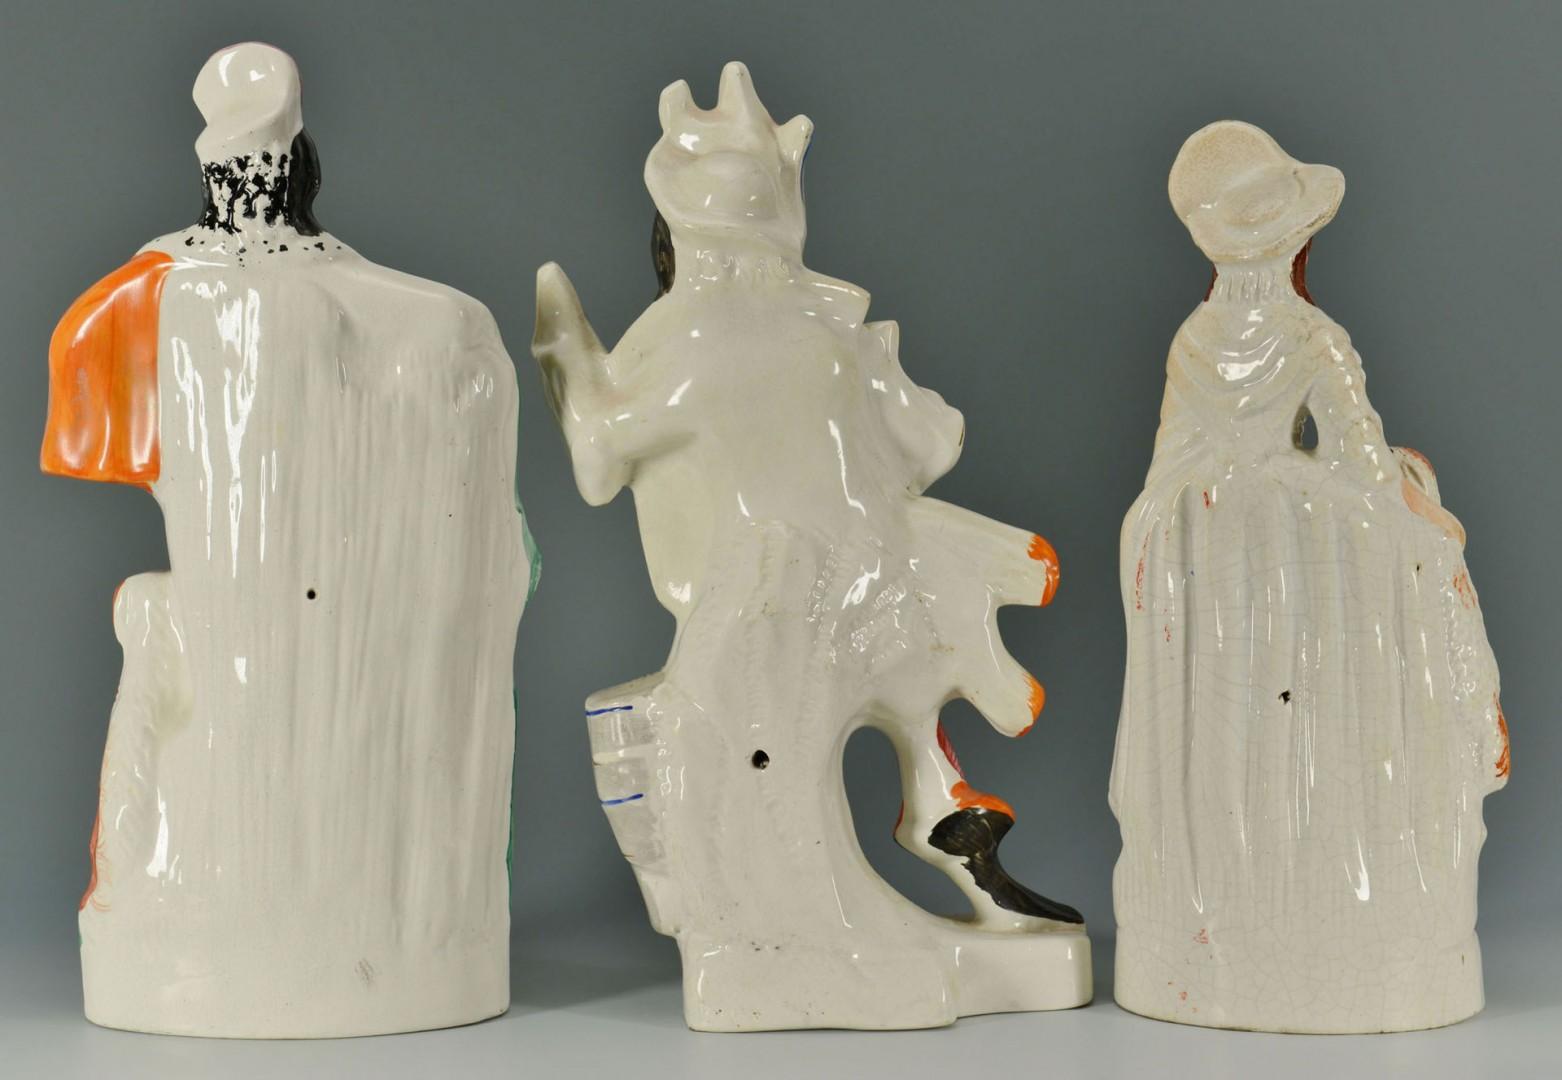 Lot 272: 3 Large Staffordshire Figures